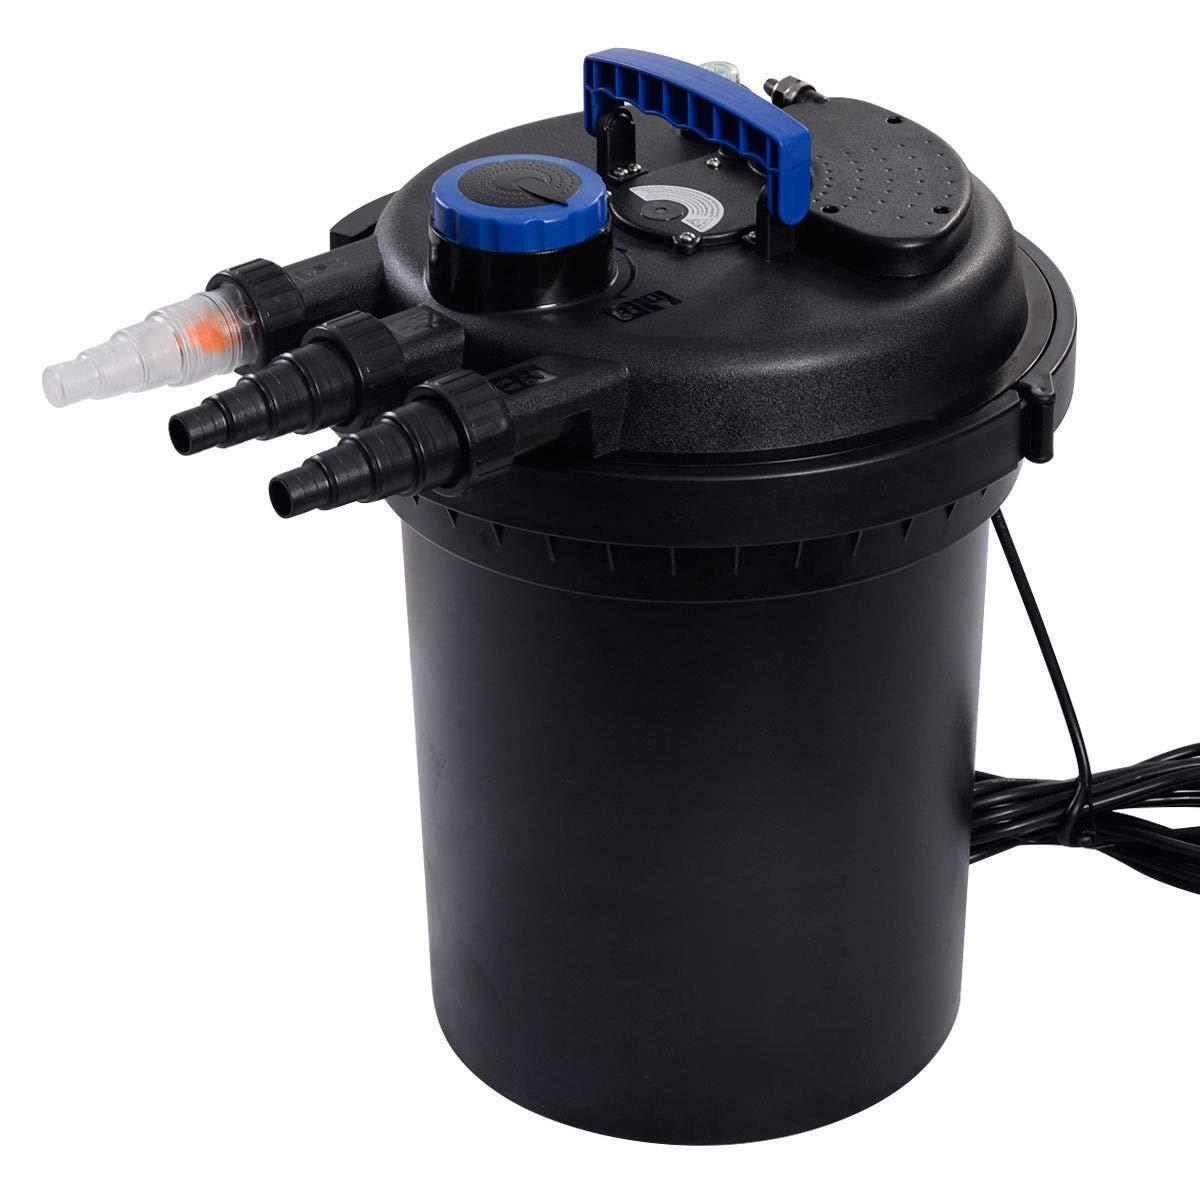 ColorsShop Pond Pressure Bio Filter 4000GAL W/ 13W UV Sterilizer Light 10000L Koi Water by ColorsShop